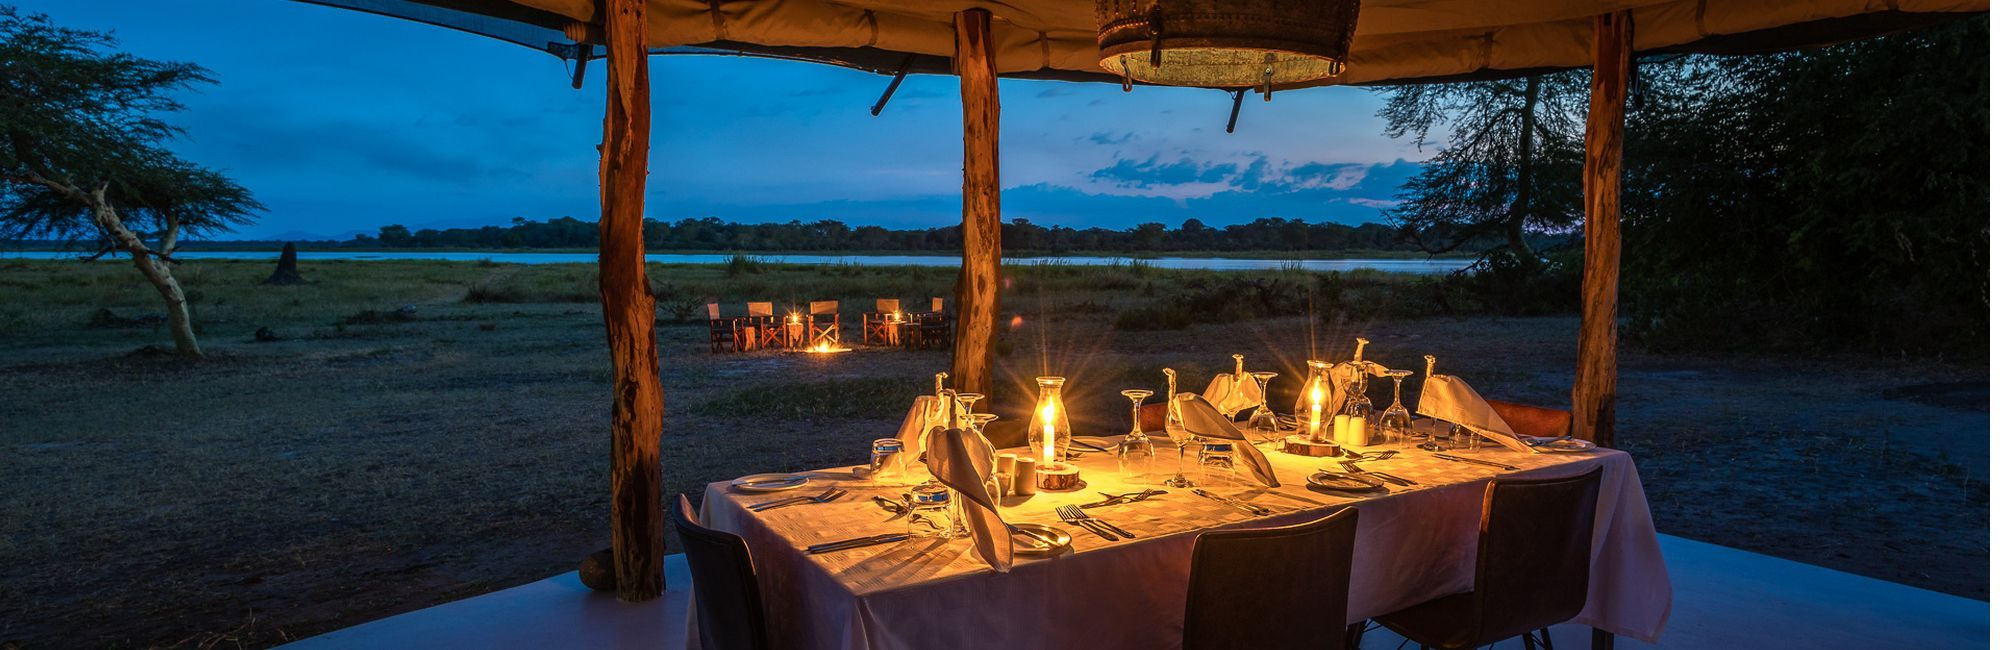 Malawi Lodges